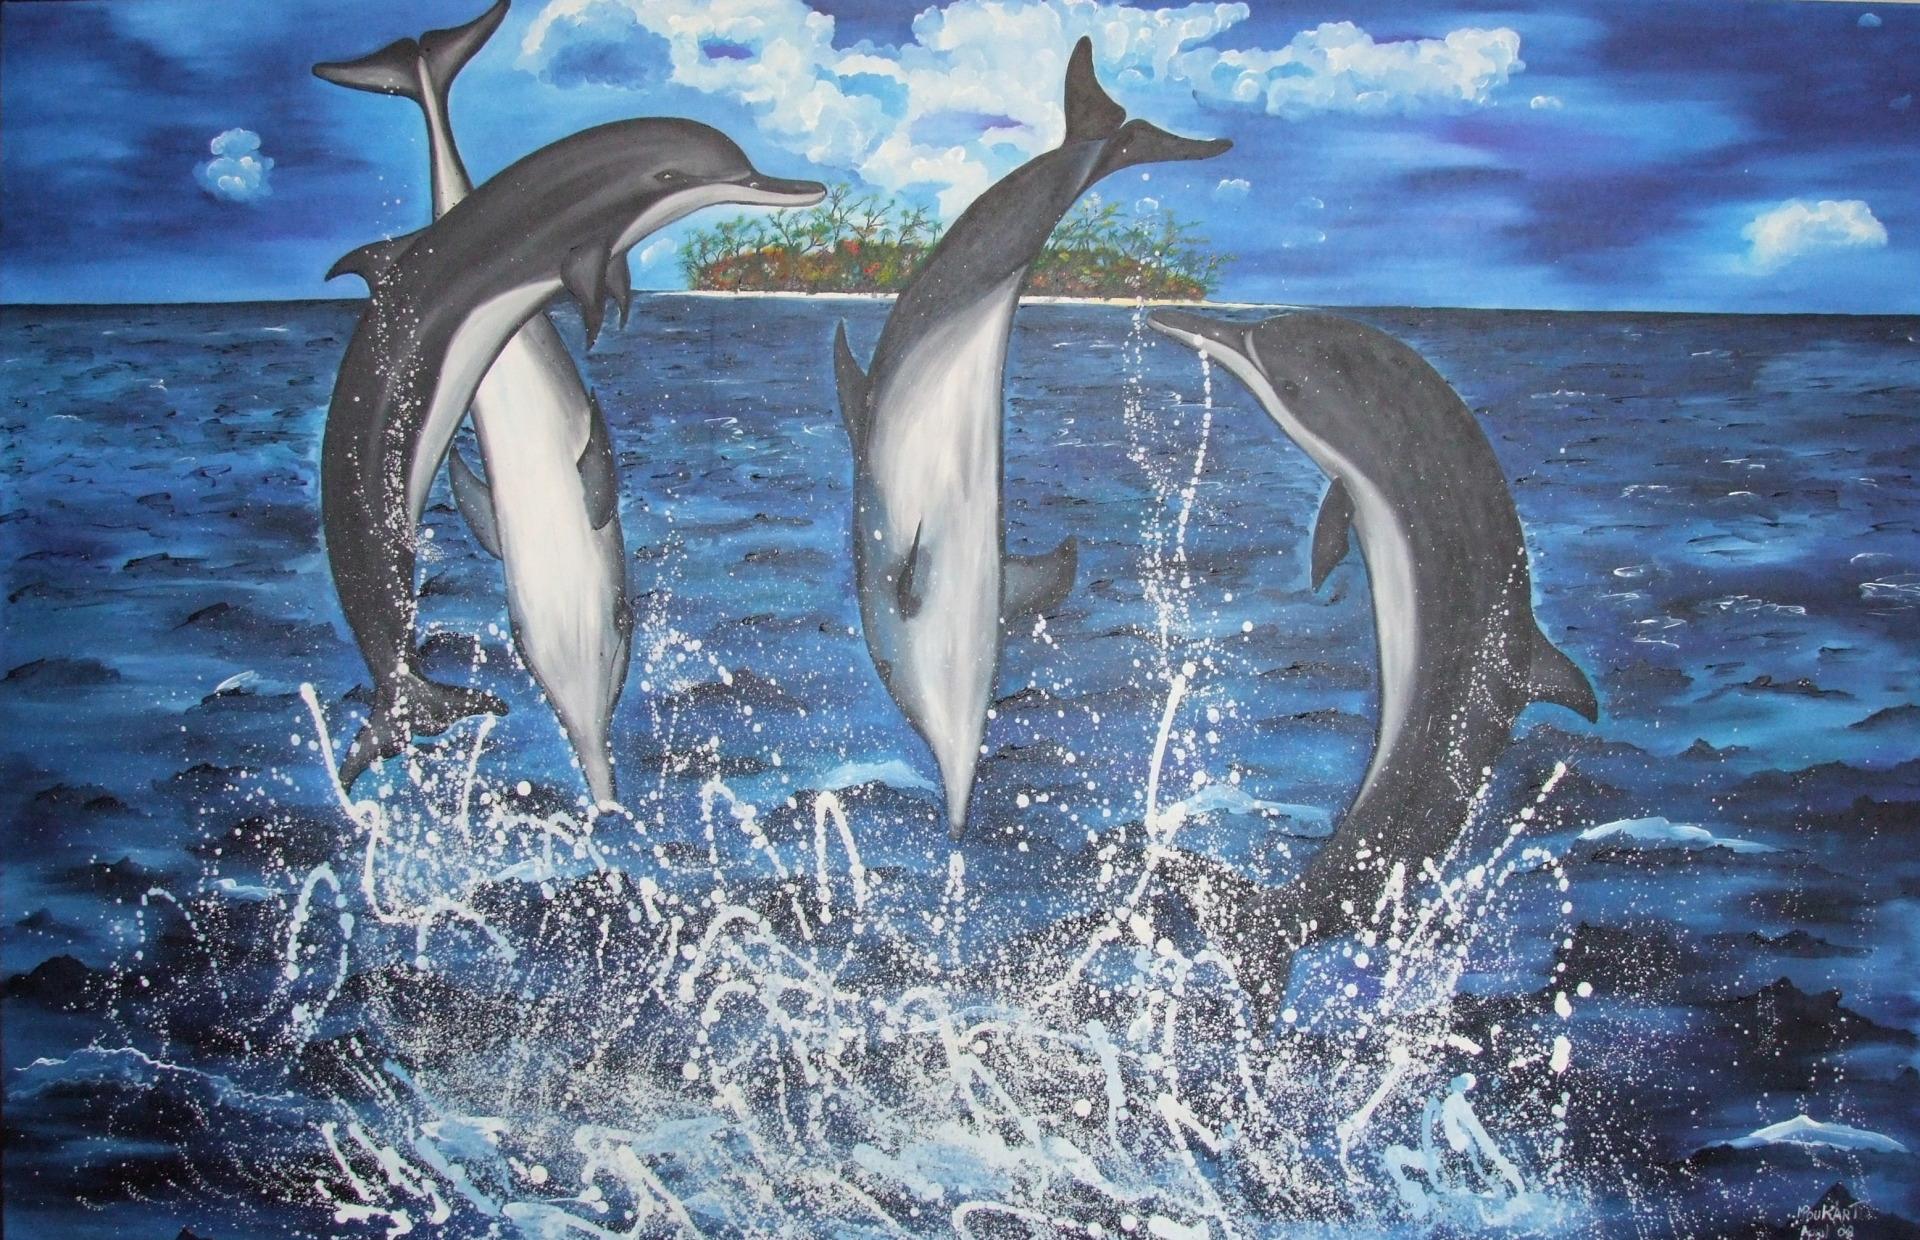 Dolphins 160 x105 cm - oil on canvas